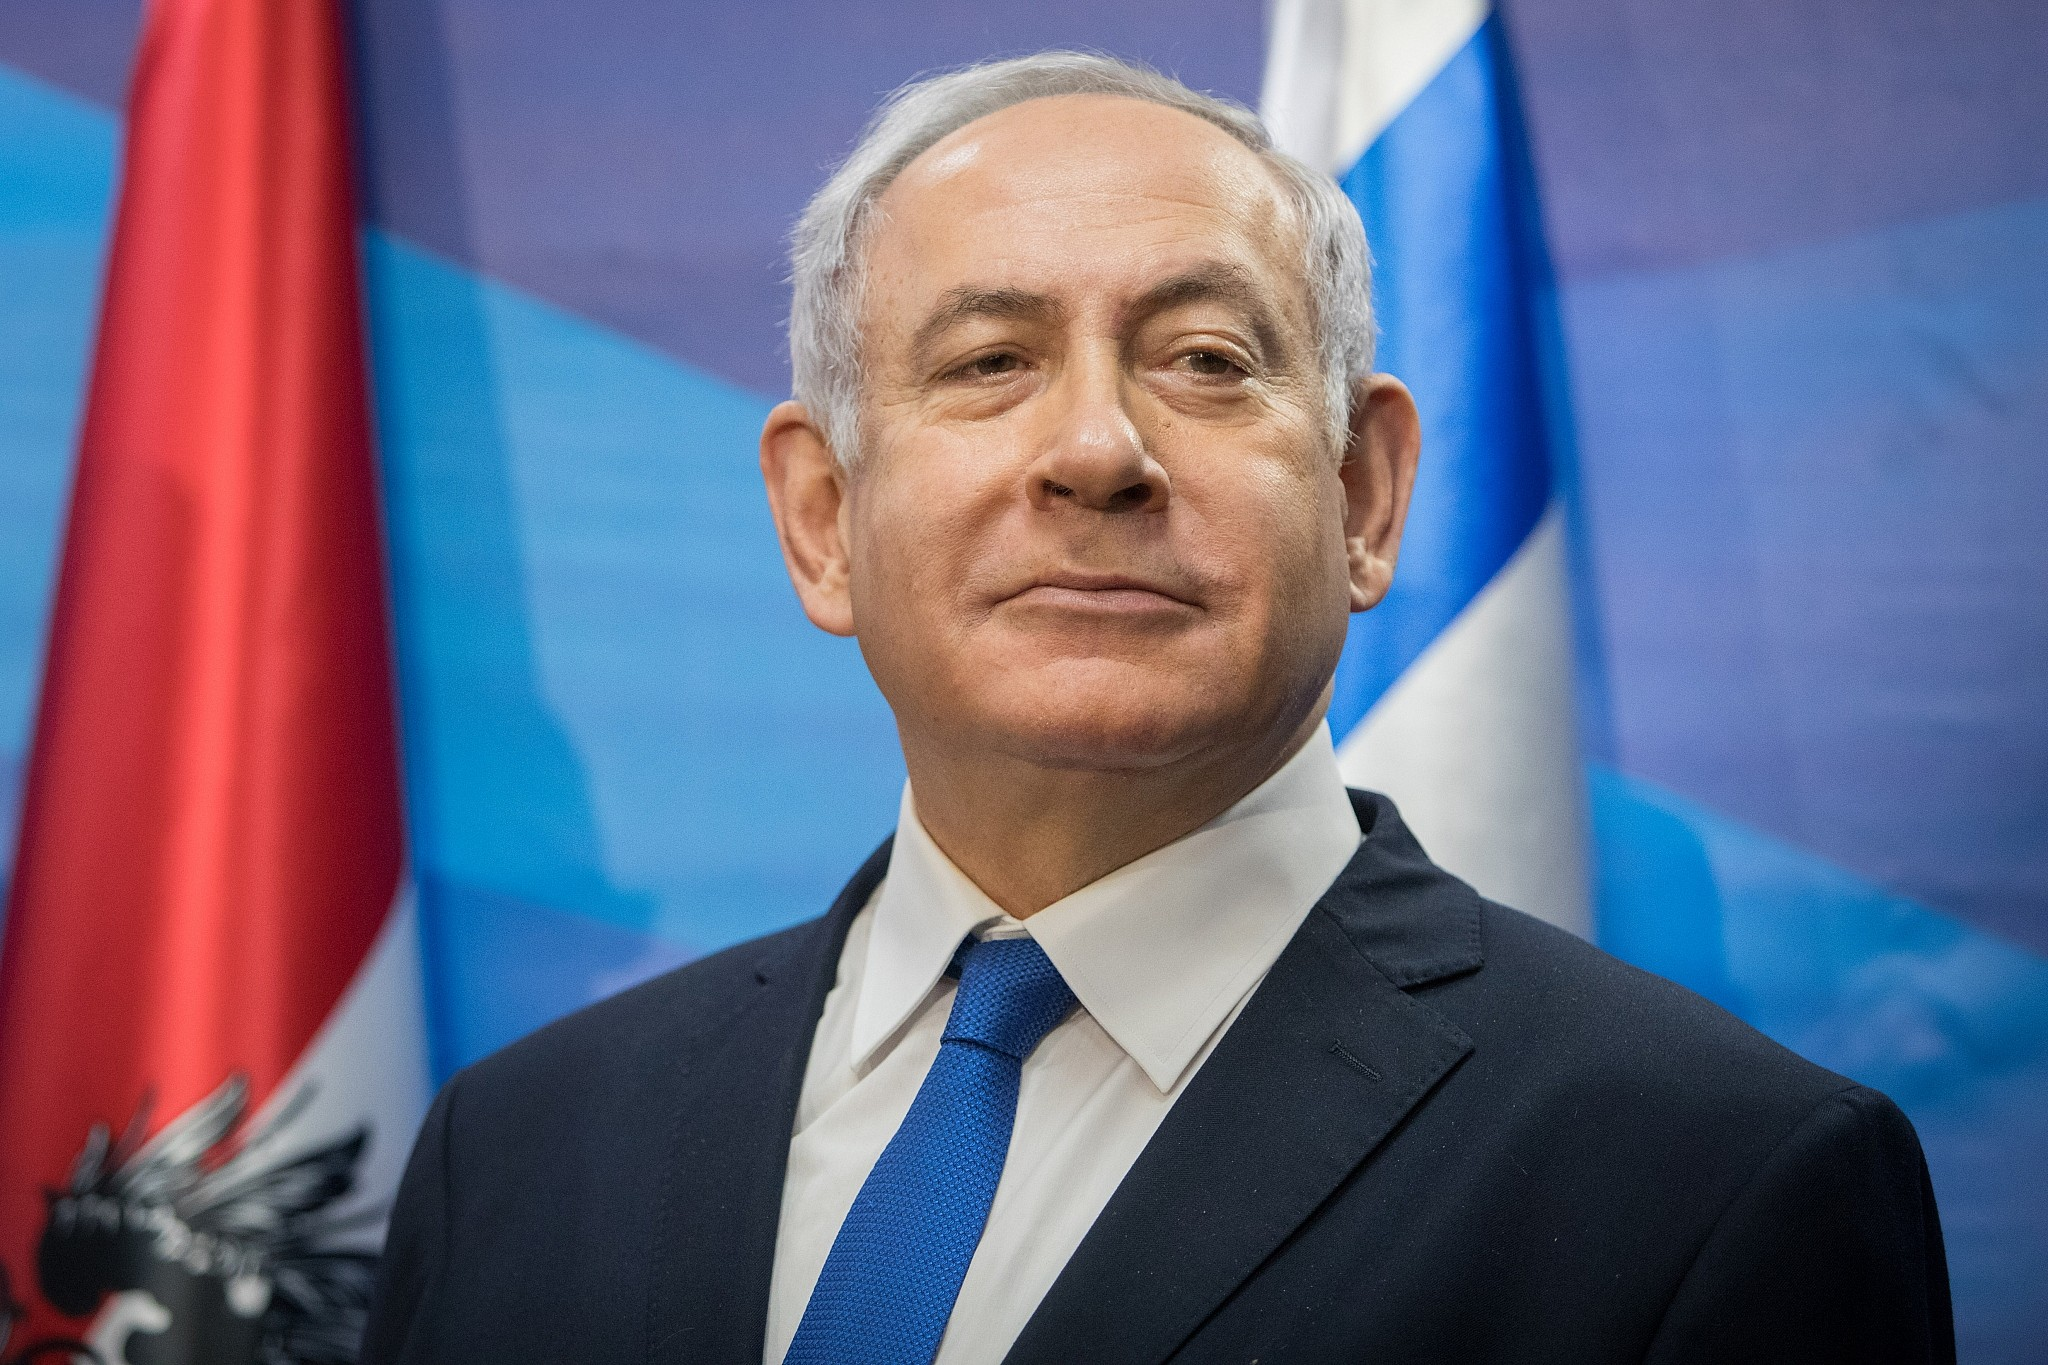 Netanyahu allies with Jewish supremacists ahead of Israeli election